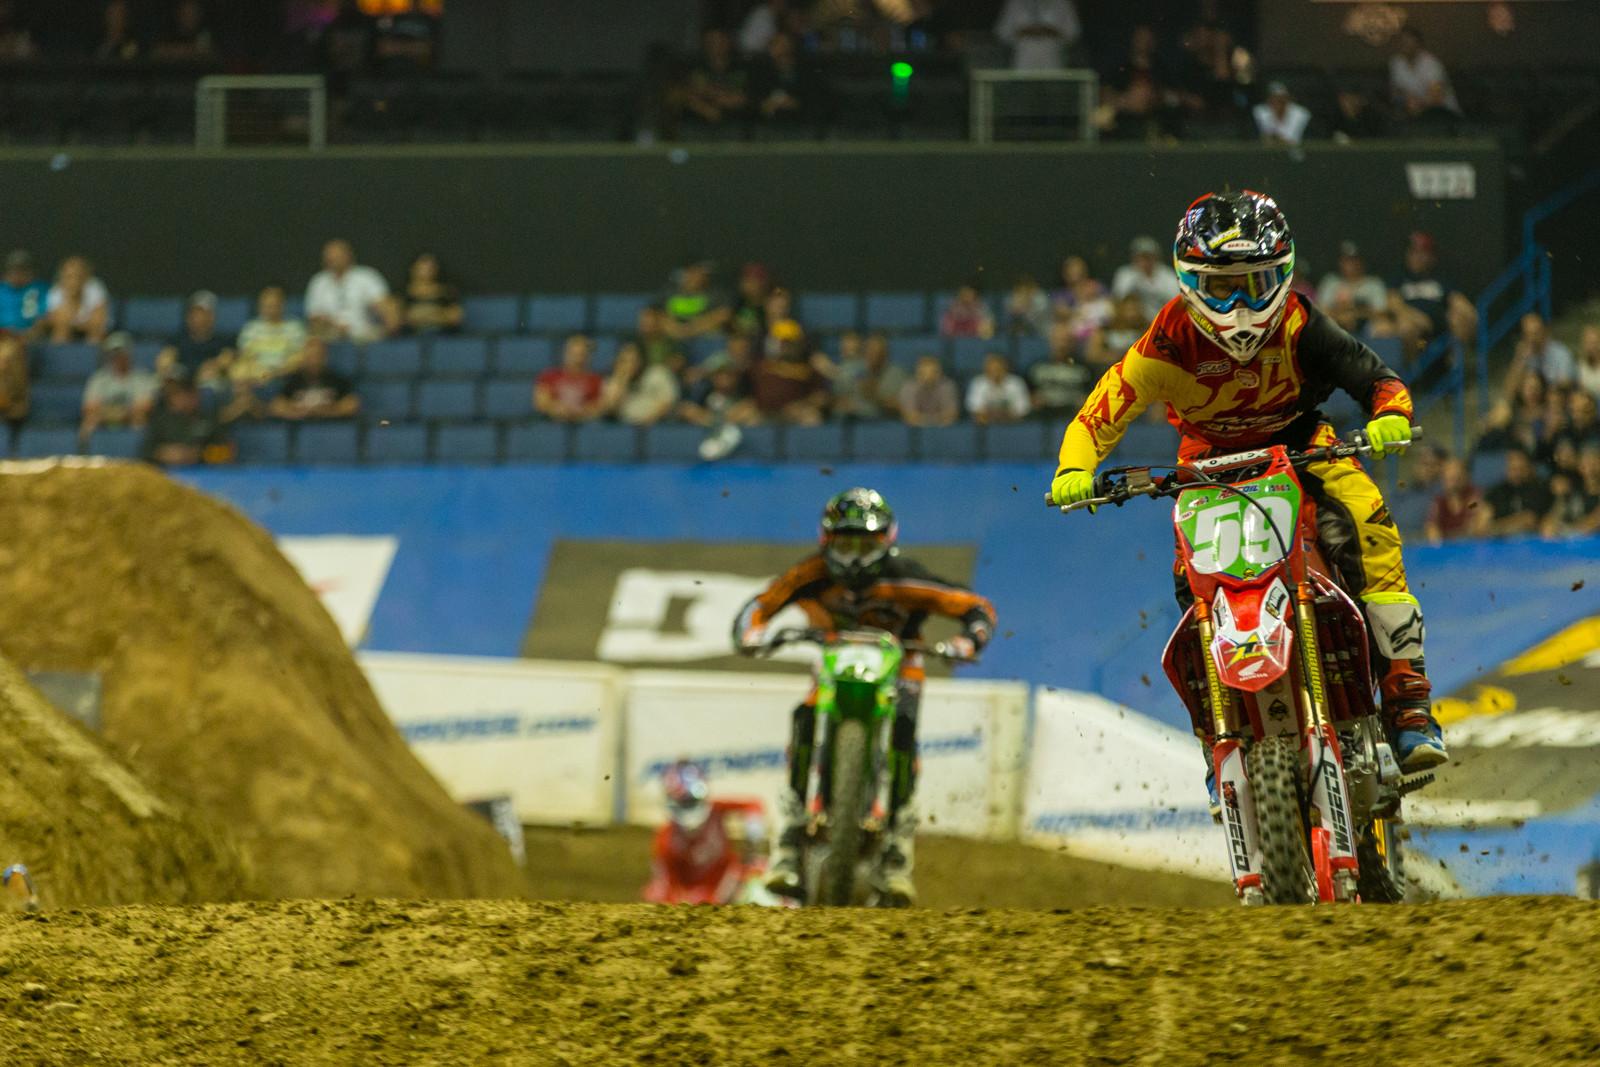 Jace Owen - Photo Gallery: Ontario Arenacross - Saturday Night - Motocross Pictures - Vital MX